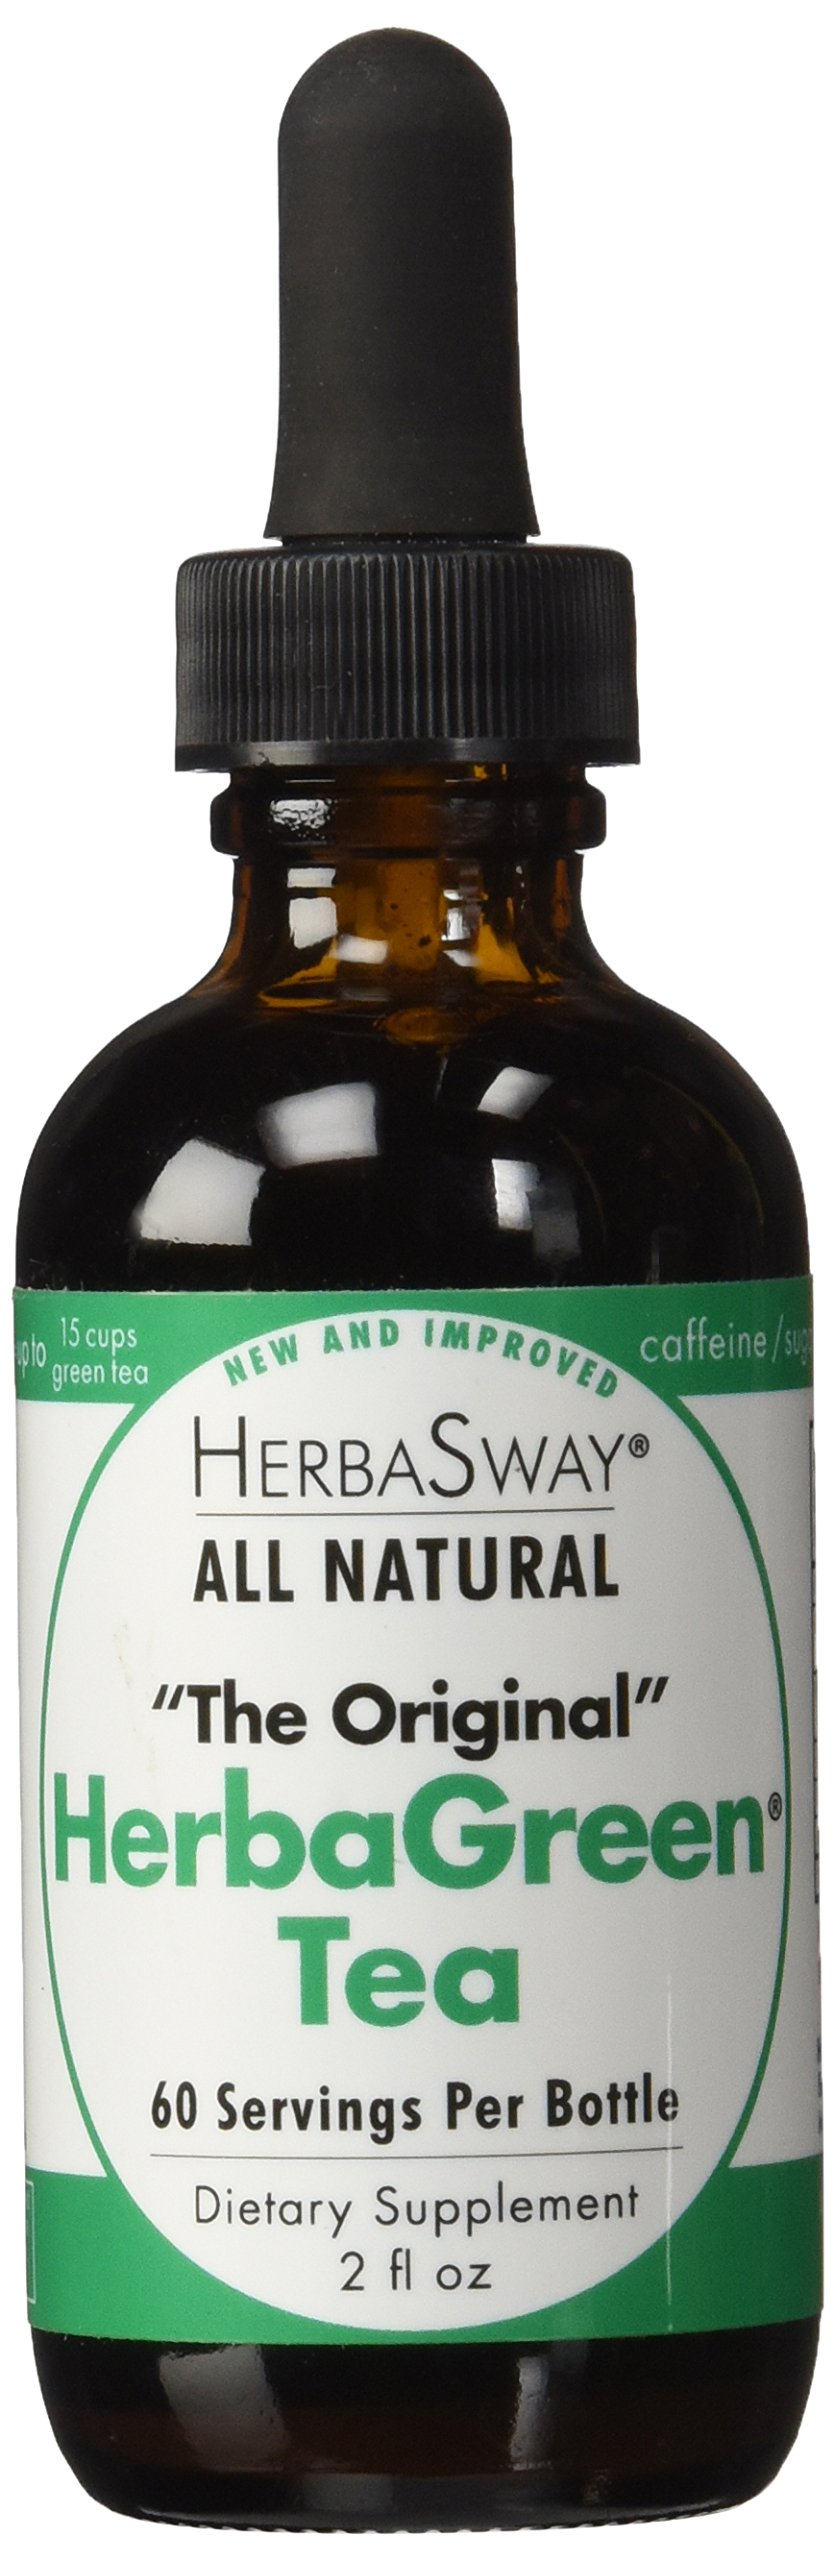 HerbaSway HerbaGreen Tea, Original, 2 Ounce